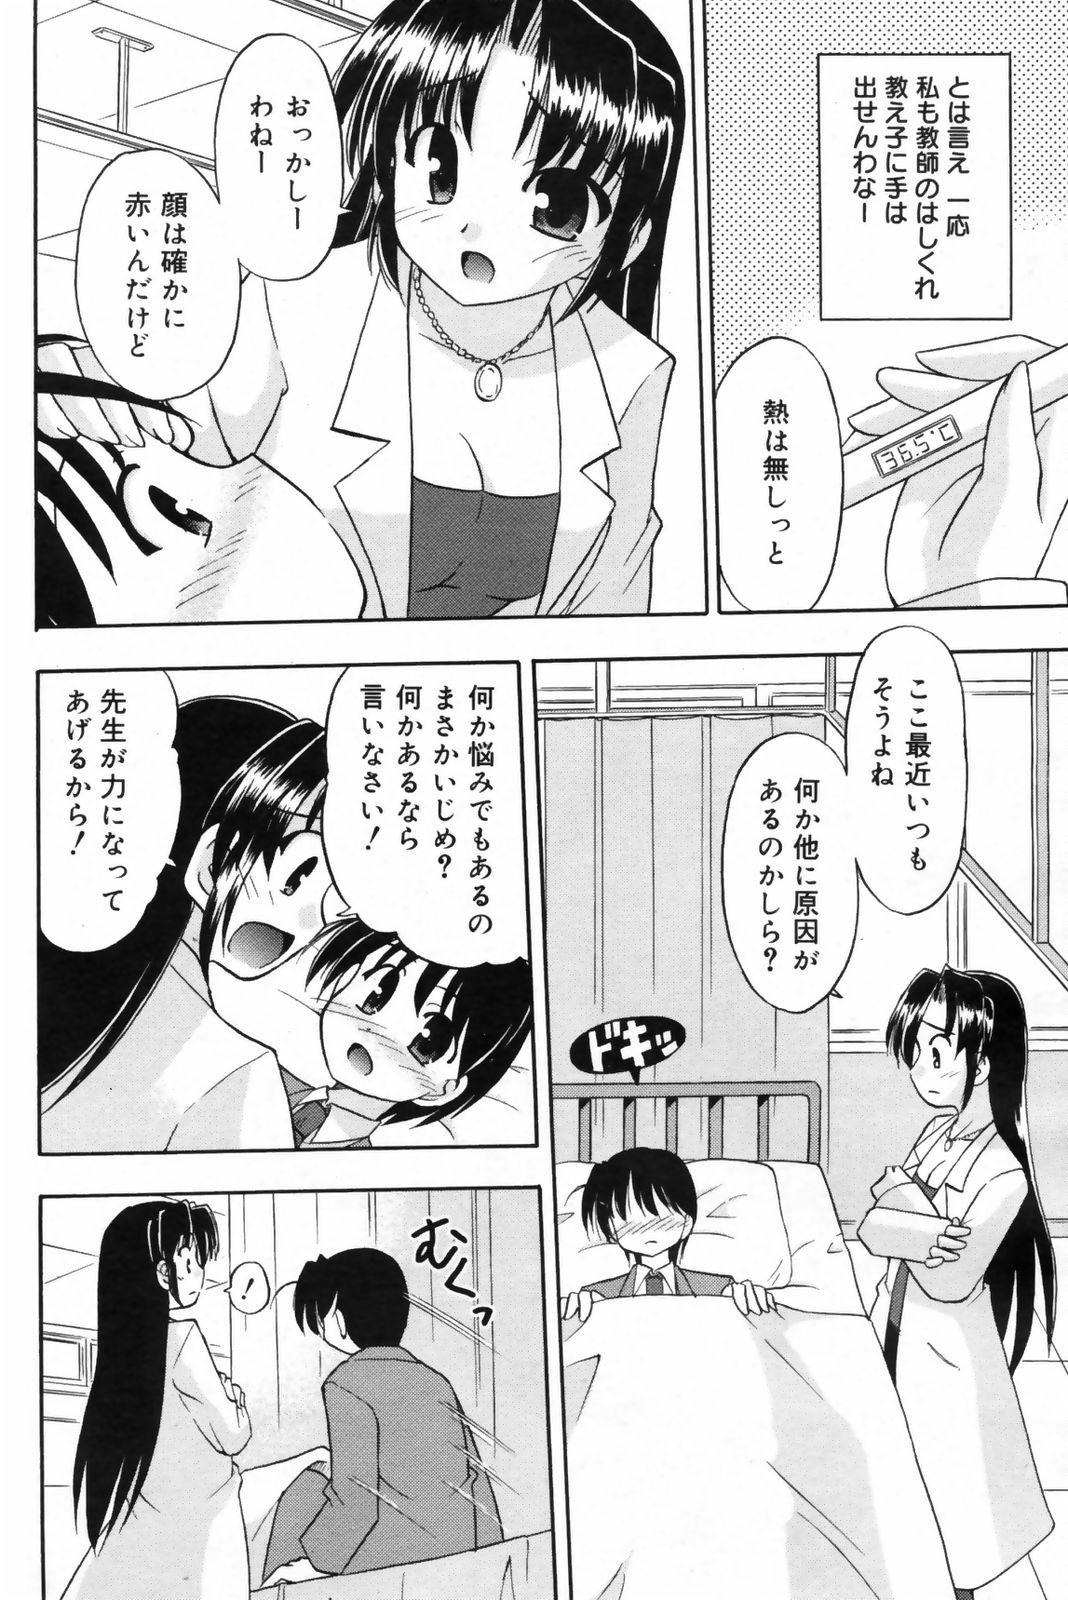 Manga Bangaichi 2009-02 Vol. 234 137